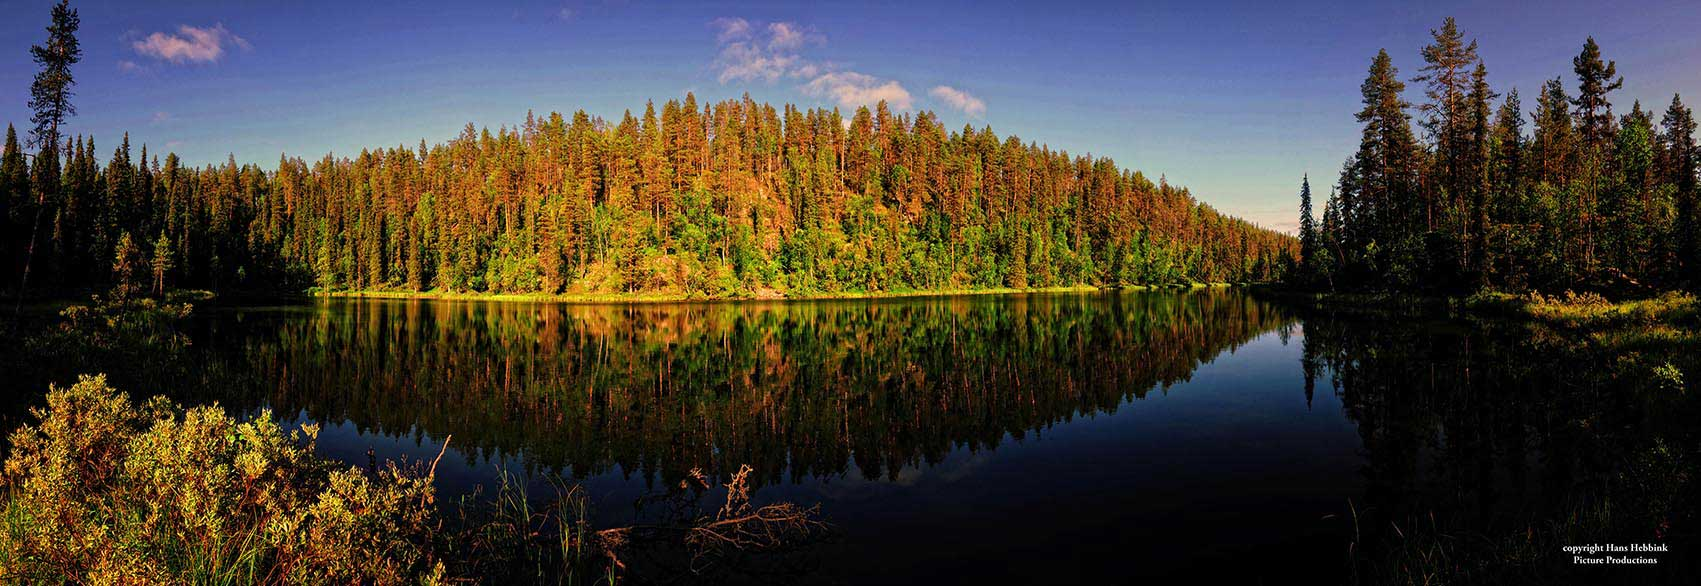 finland panorama